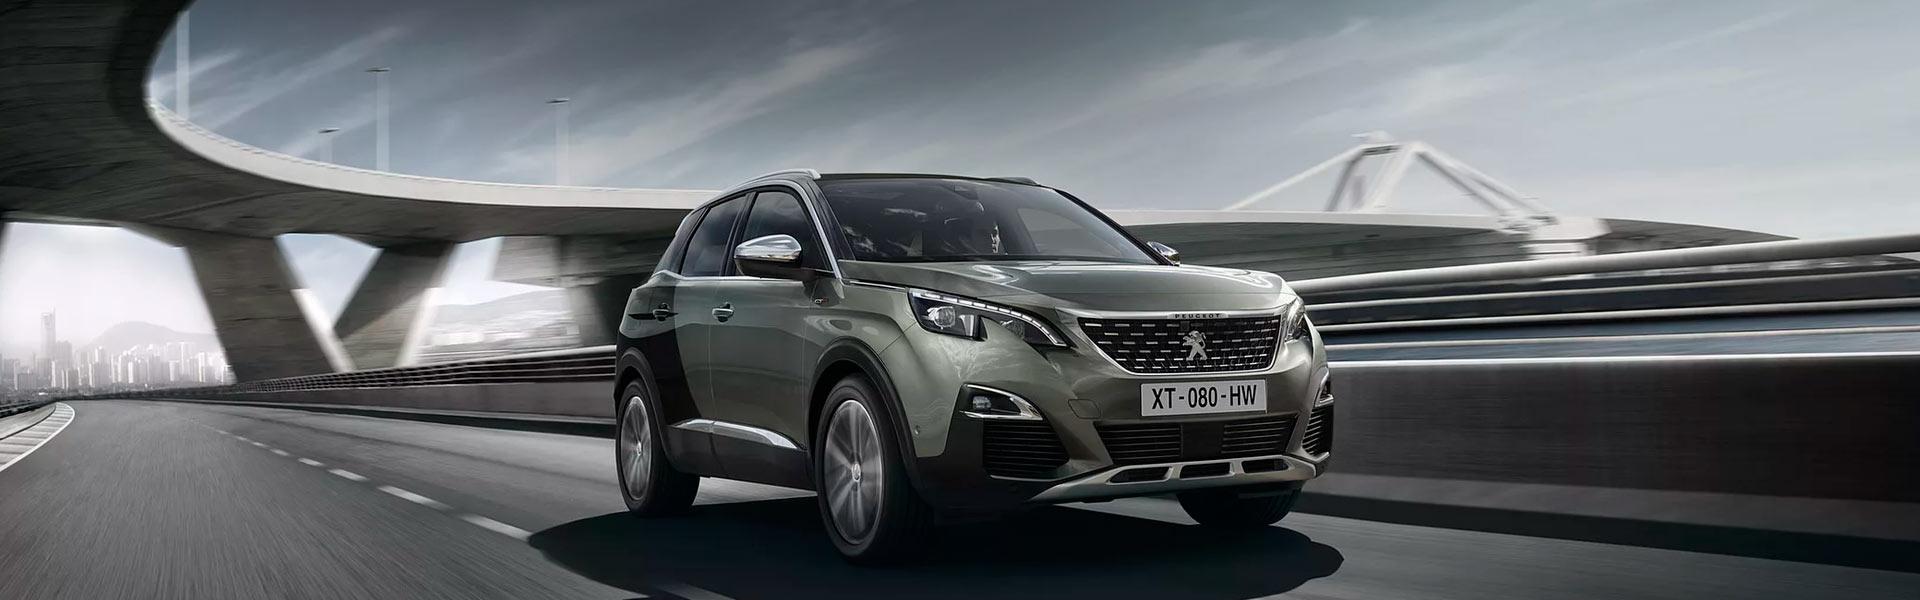 Сервис Peugeot 3008